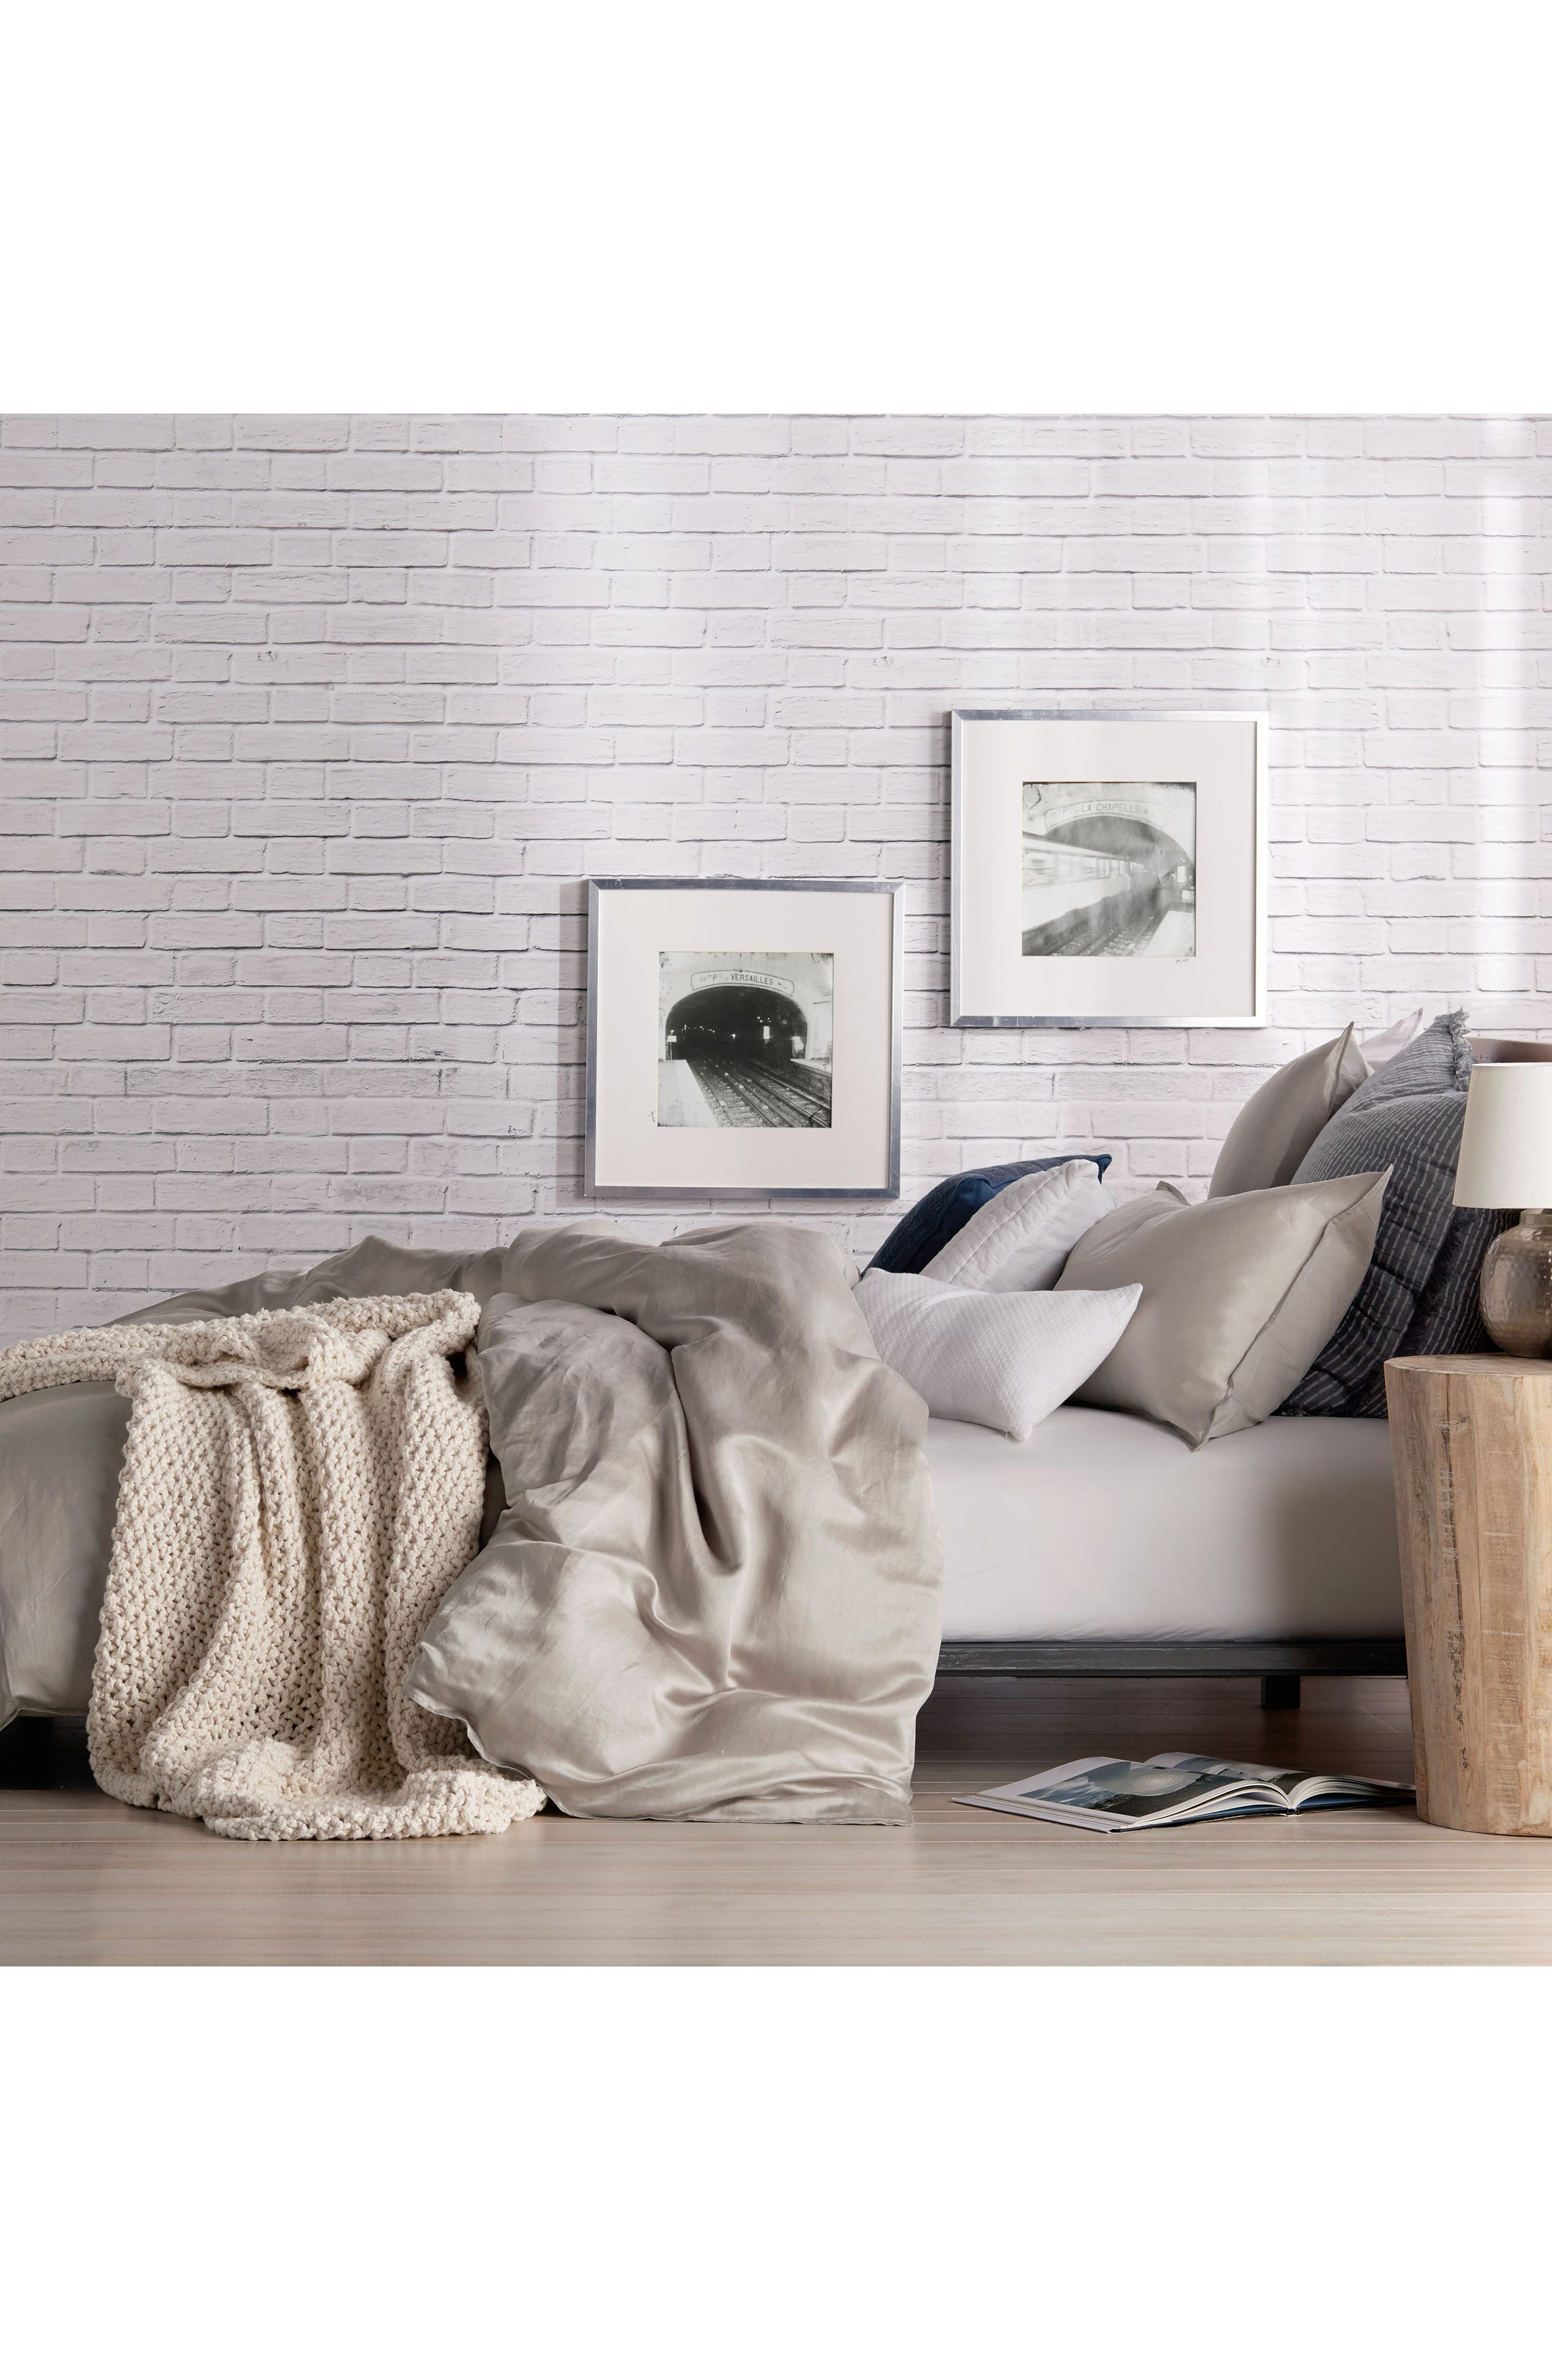 Main Image - DKNY Pure Silky Duvet Cover